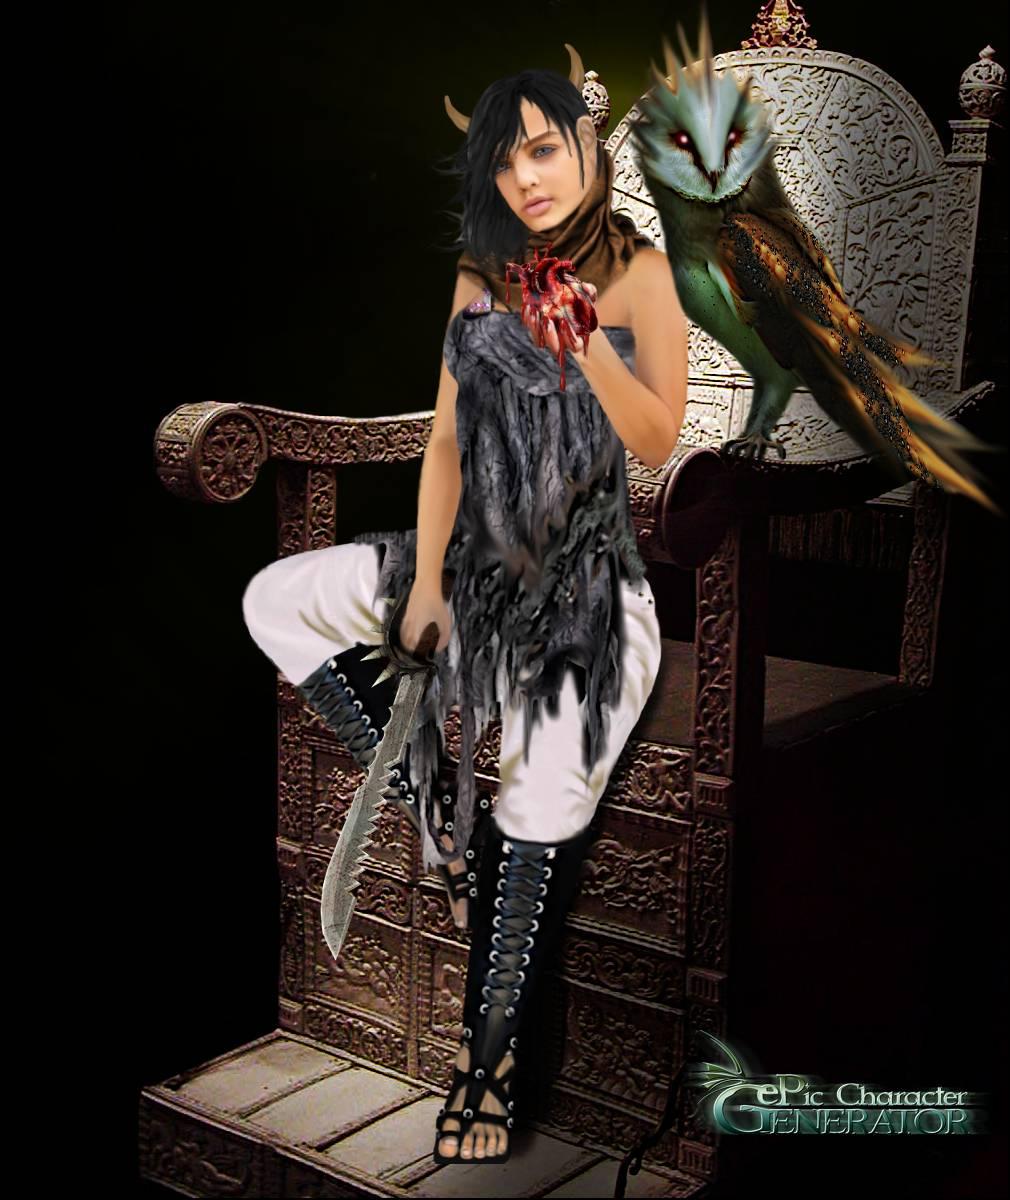 ePic Character Generator Season 3 Throne Lady Screenshot 02